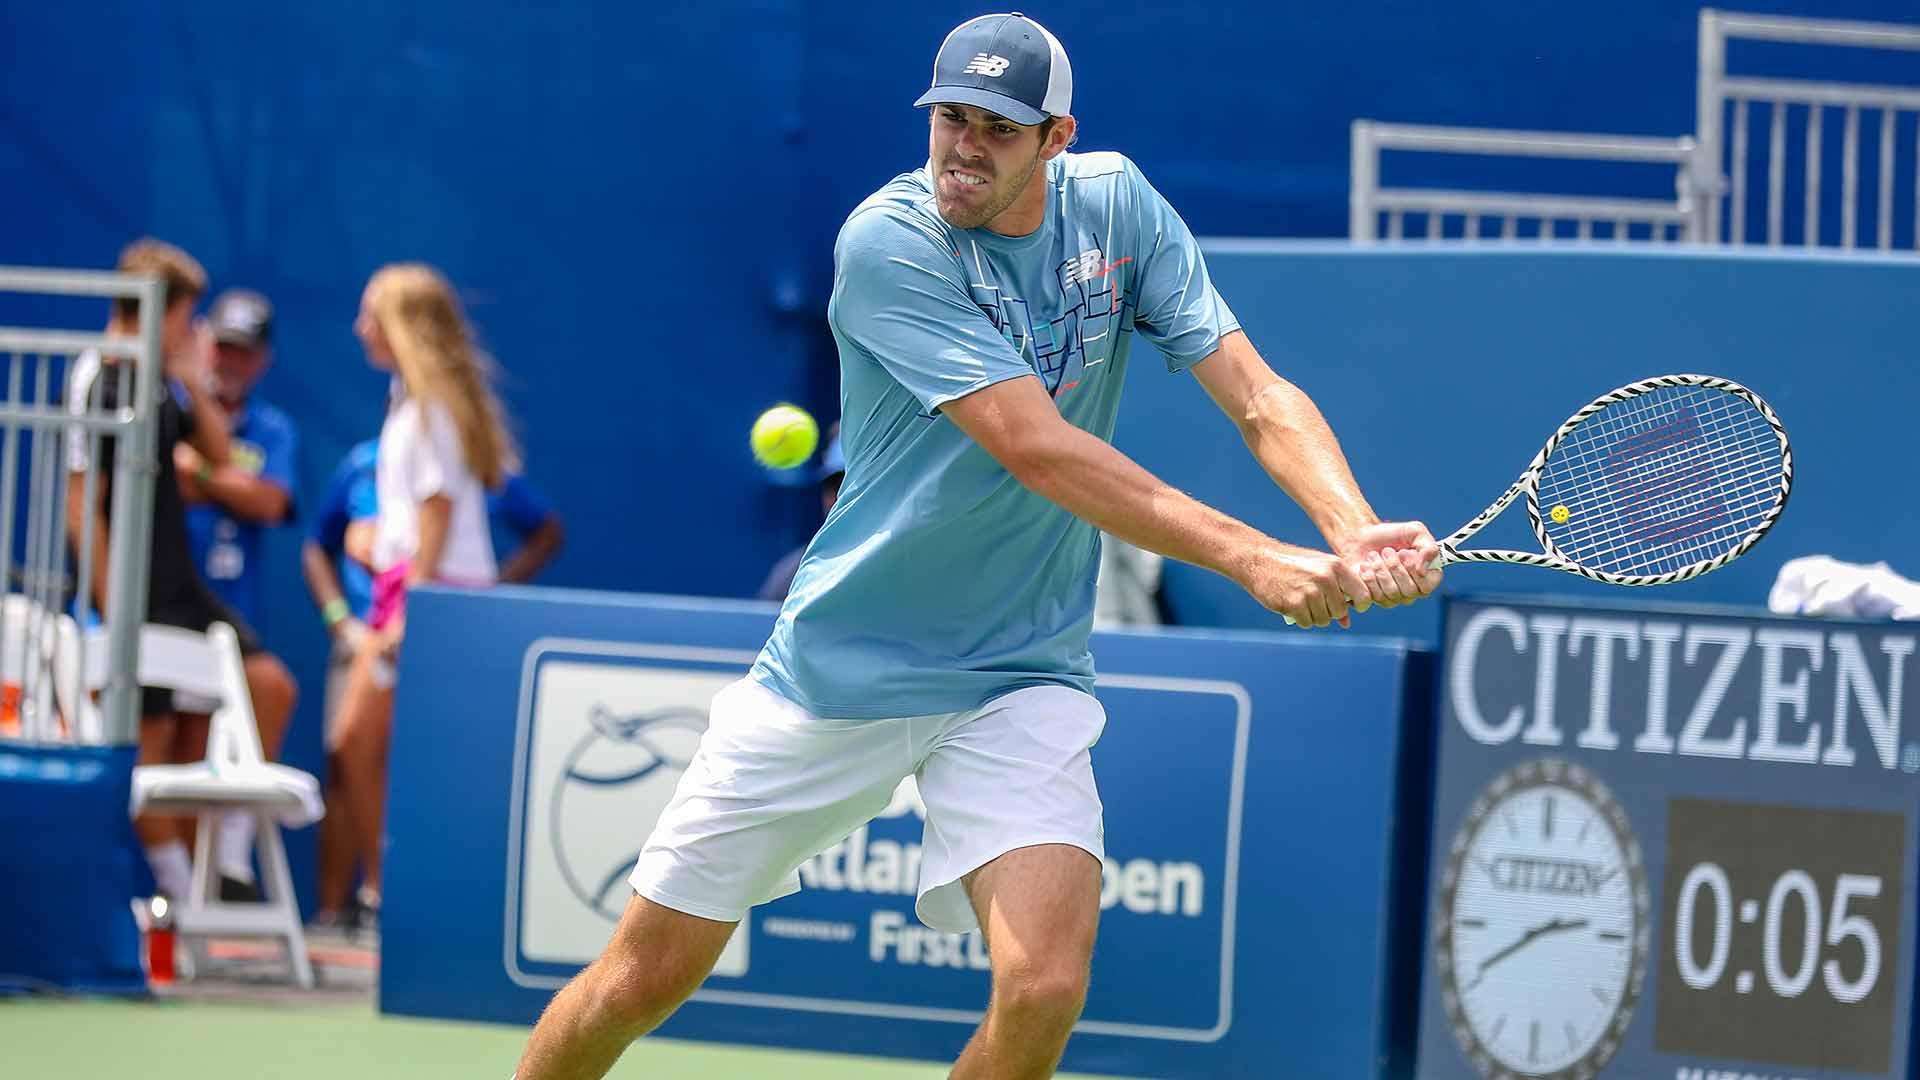 2021 Washington Open: Reilly Opelka vs. Daniel Elahi Galan Tennis Pick and Prediction